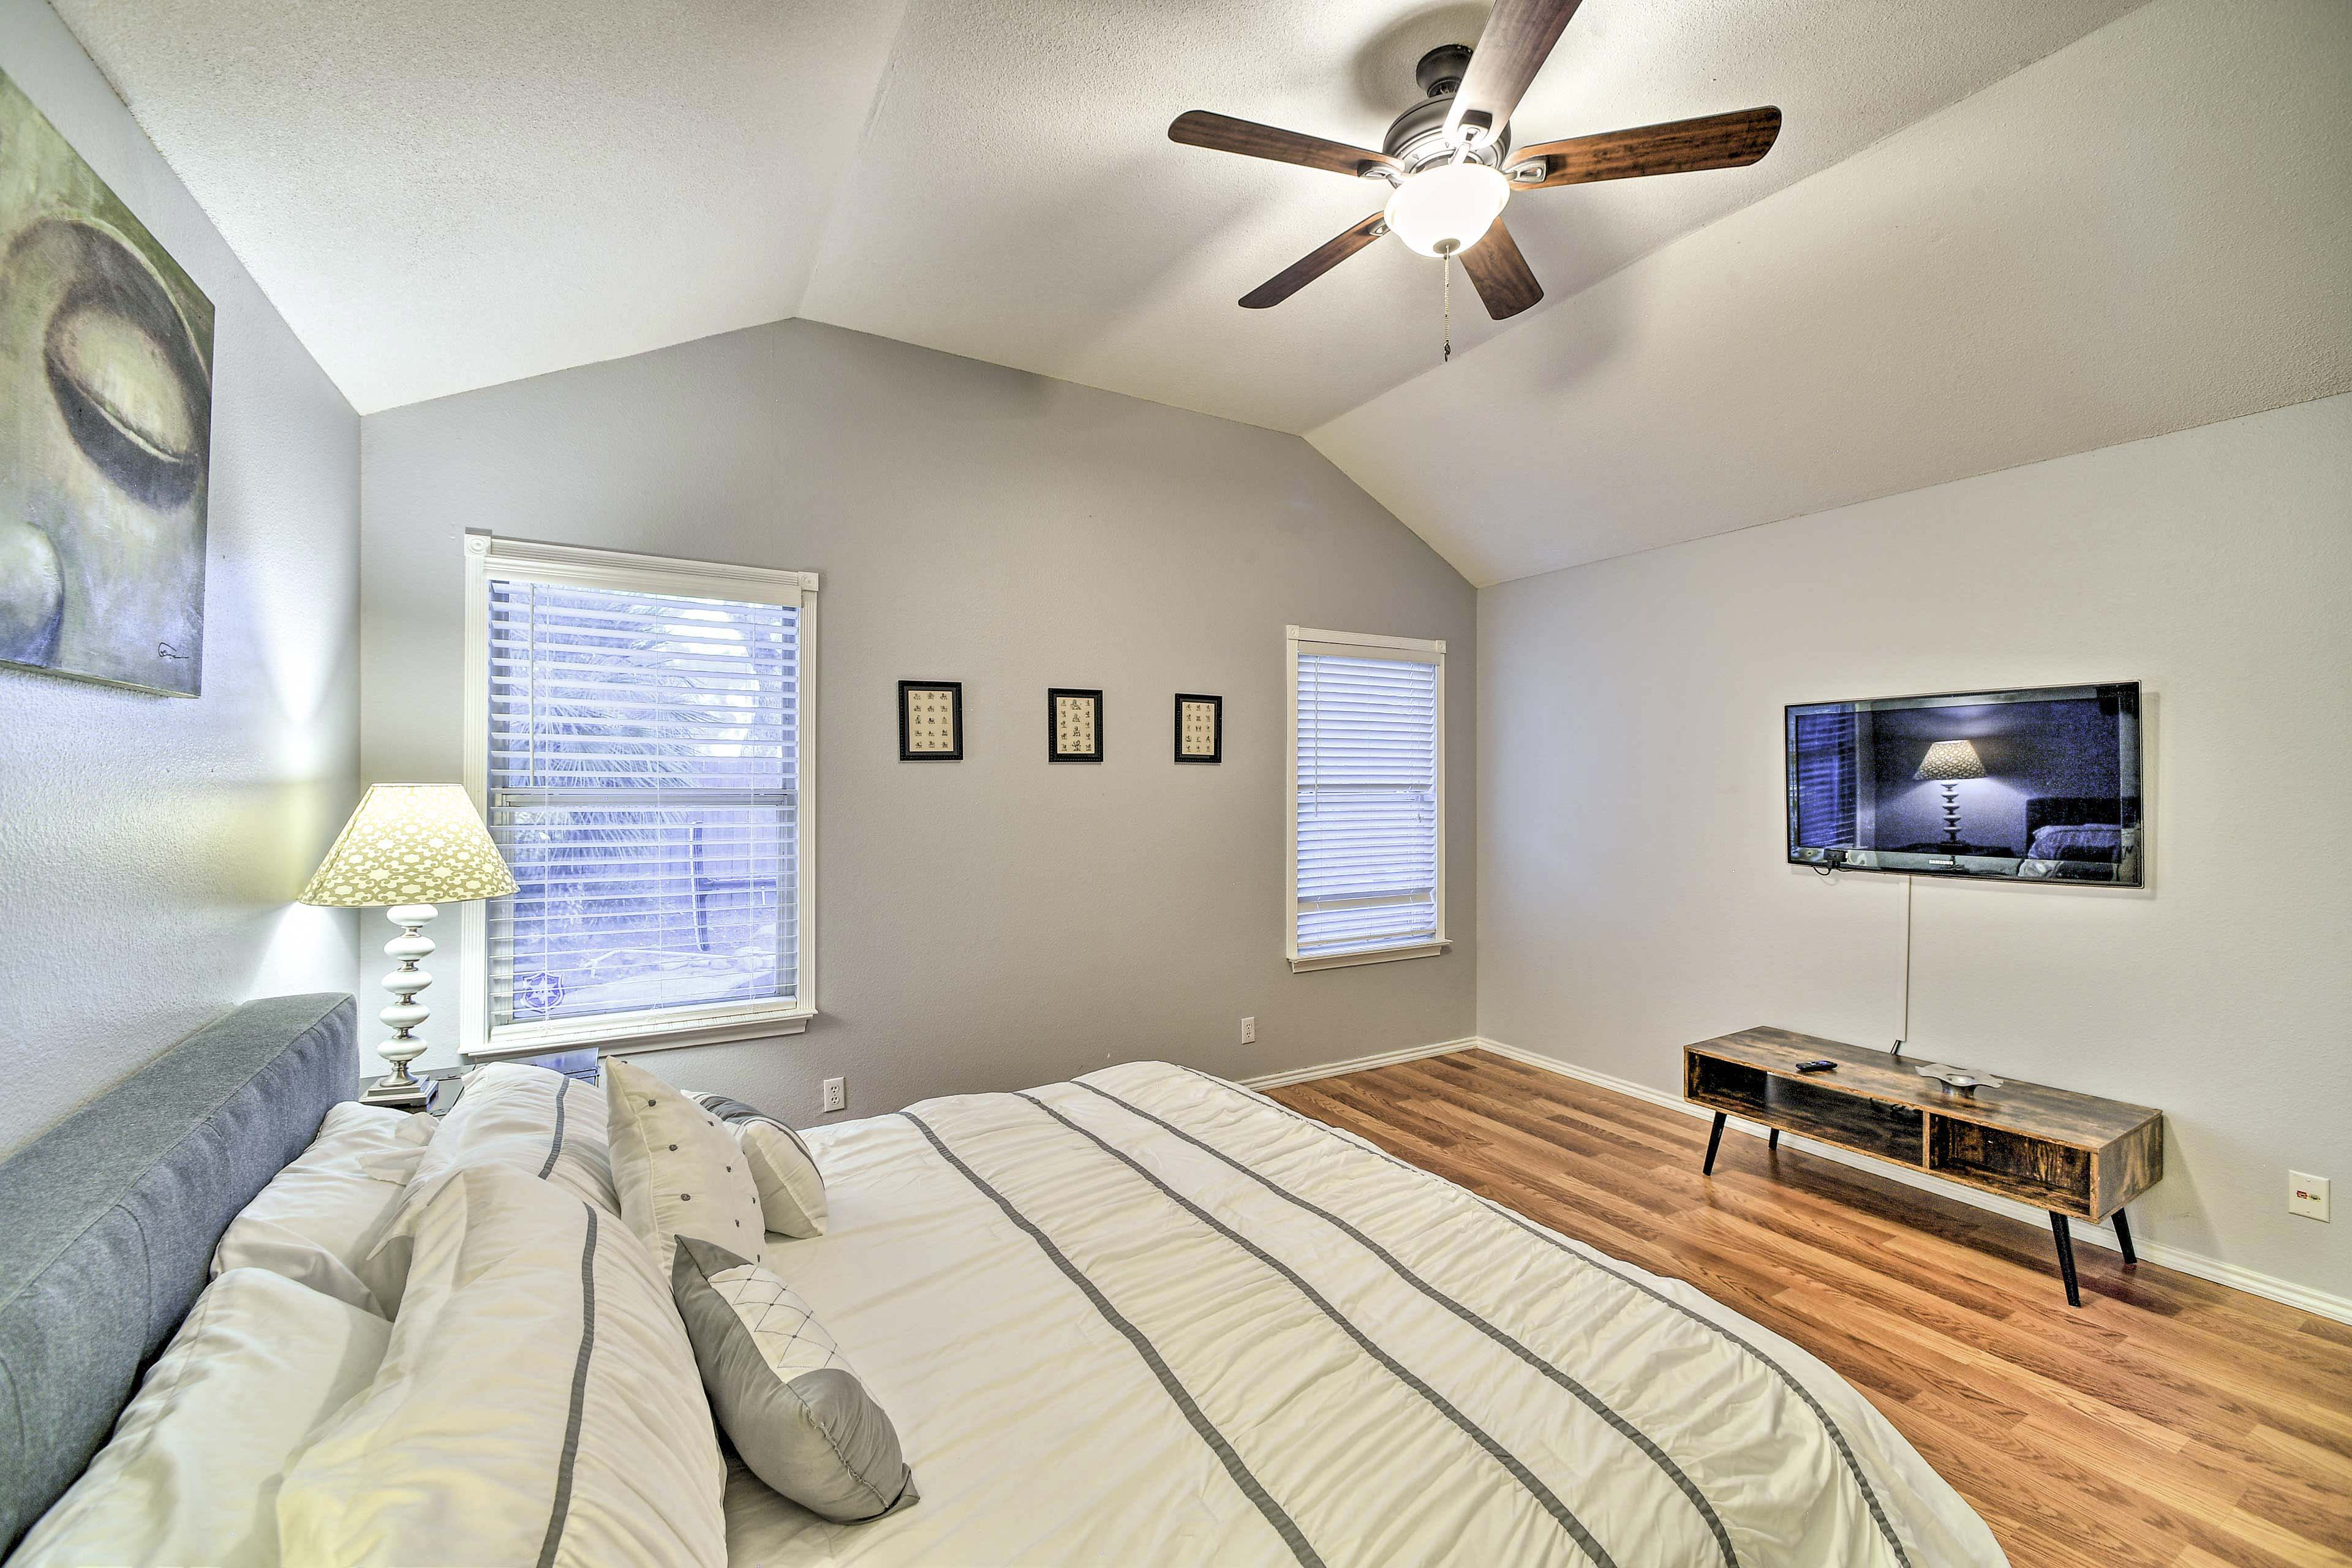 Bedroom 1 | Mounted TV